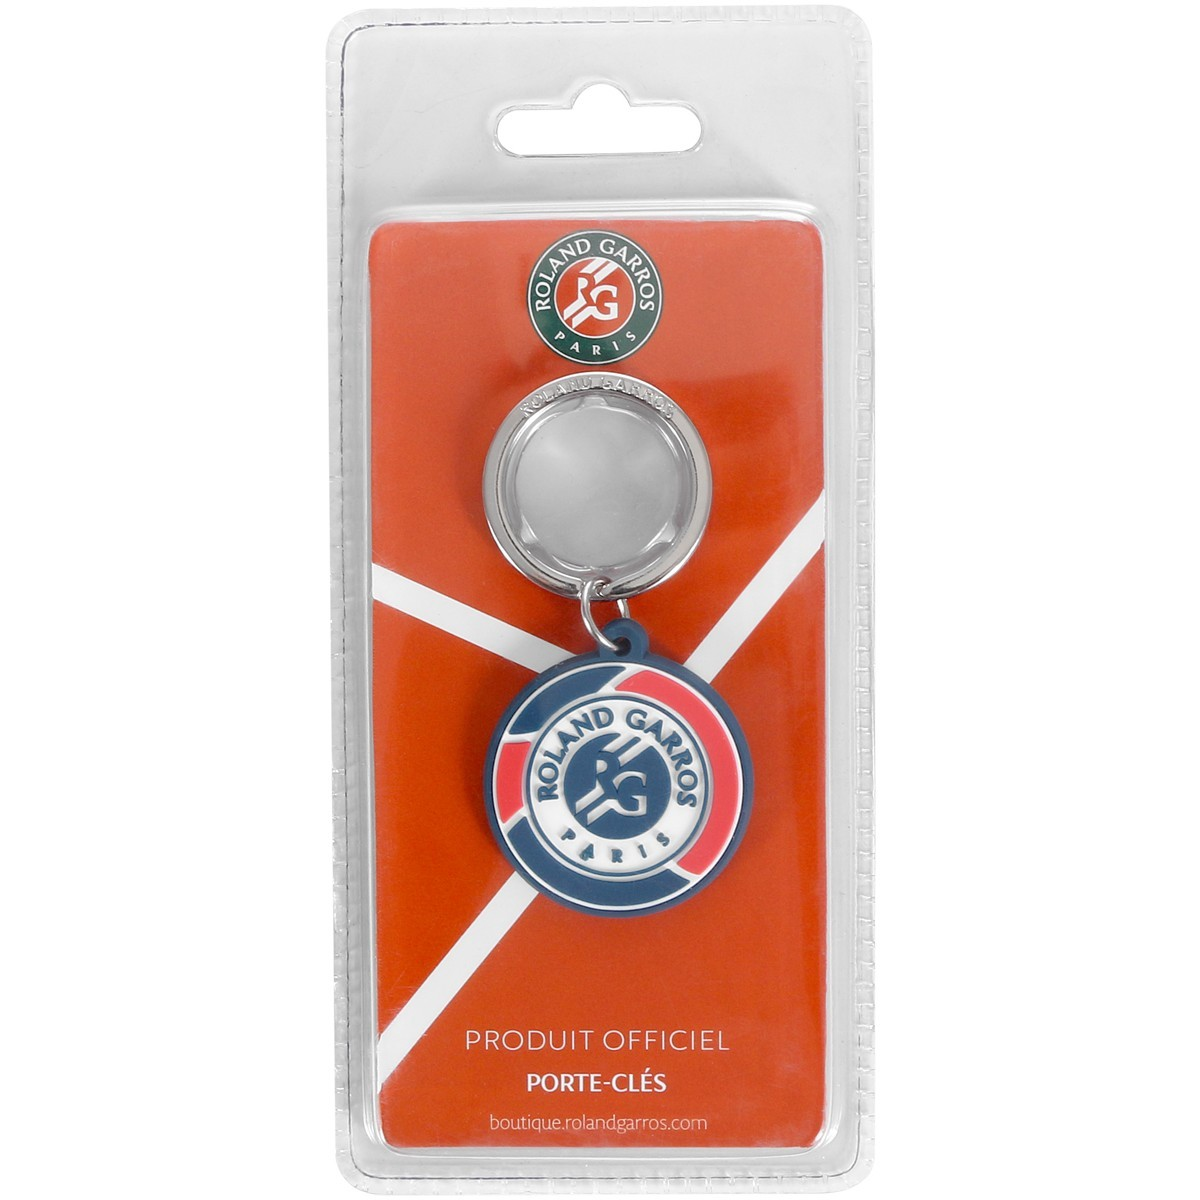 Брелок Rolland Garros Three Tone logo keychain